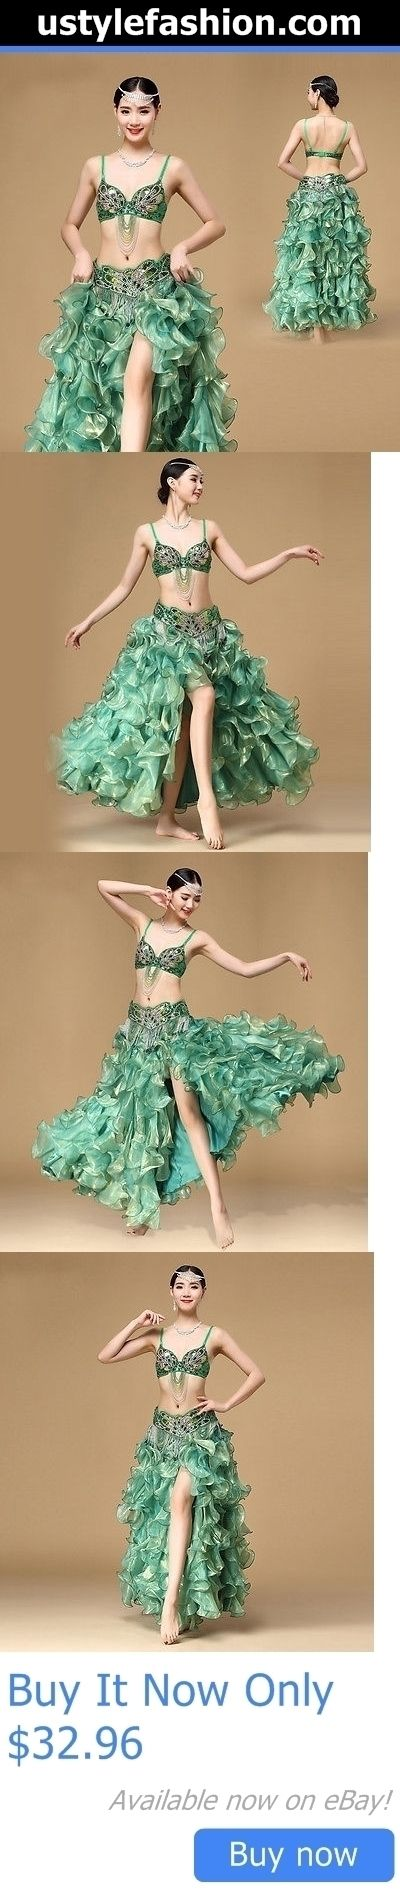 Dancewear: New Belly Dance Costume Set Bra Top Belt Skirt Dress Rio Carnival Bollywood 3Pcs BUY IT NOW ONLY: $32.96 #ustylefashionDancewear OR #ustylefashion